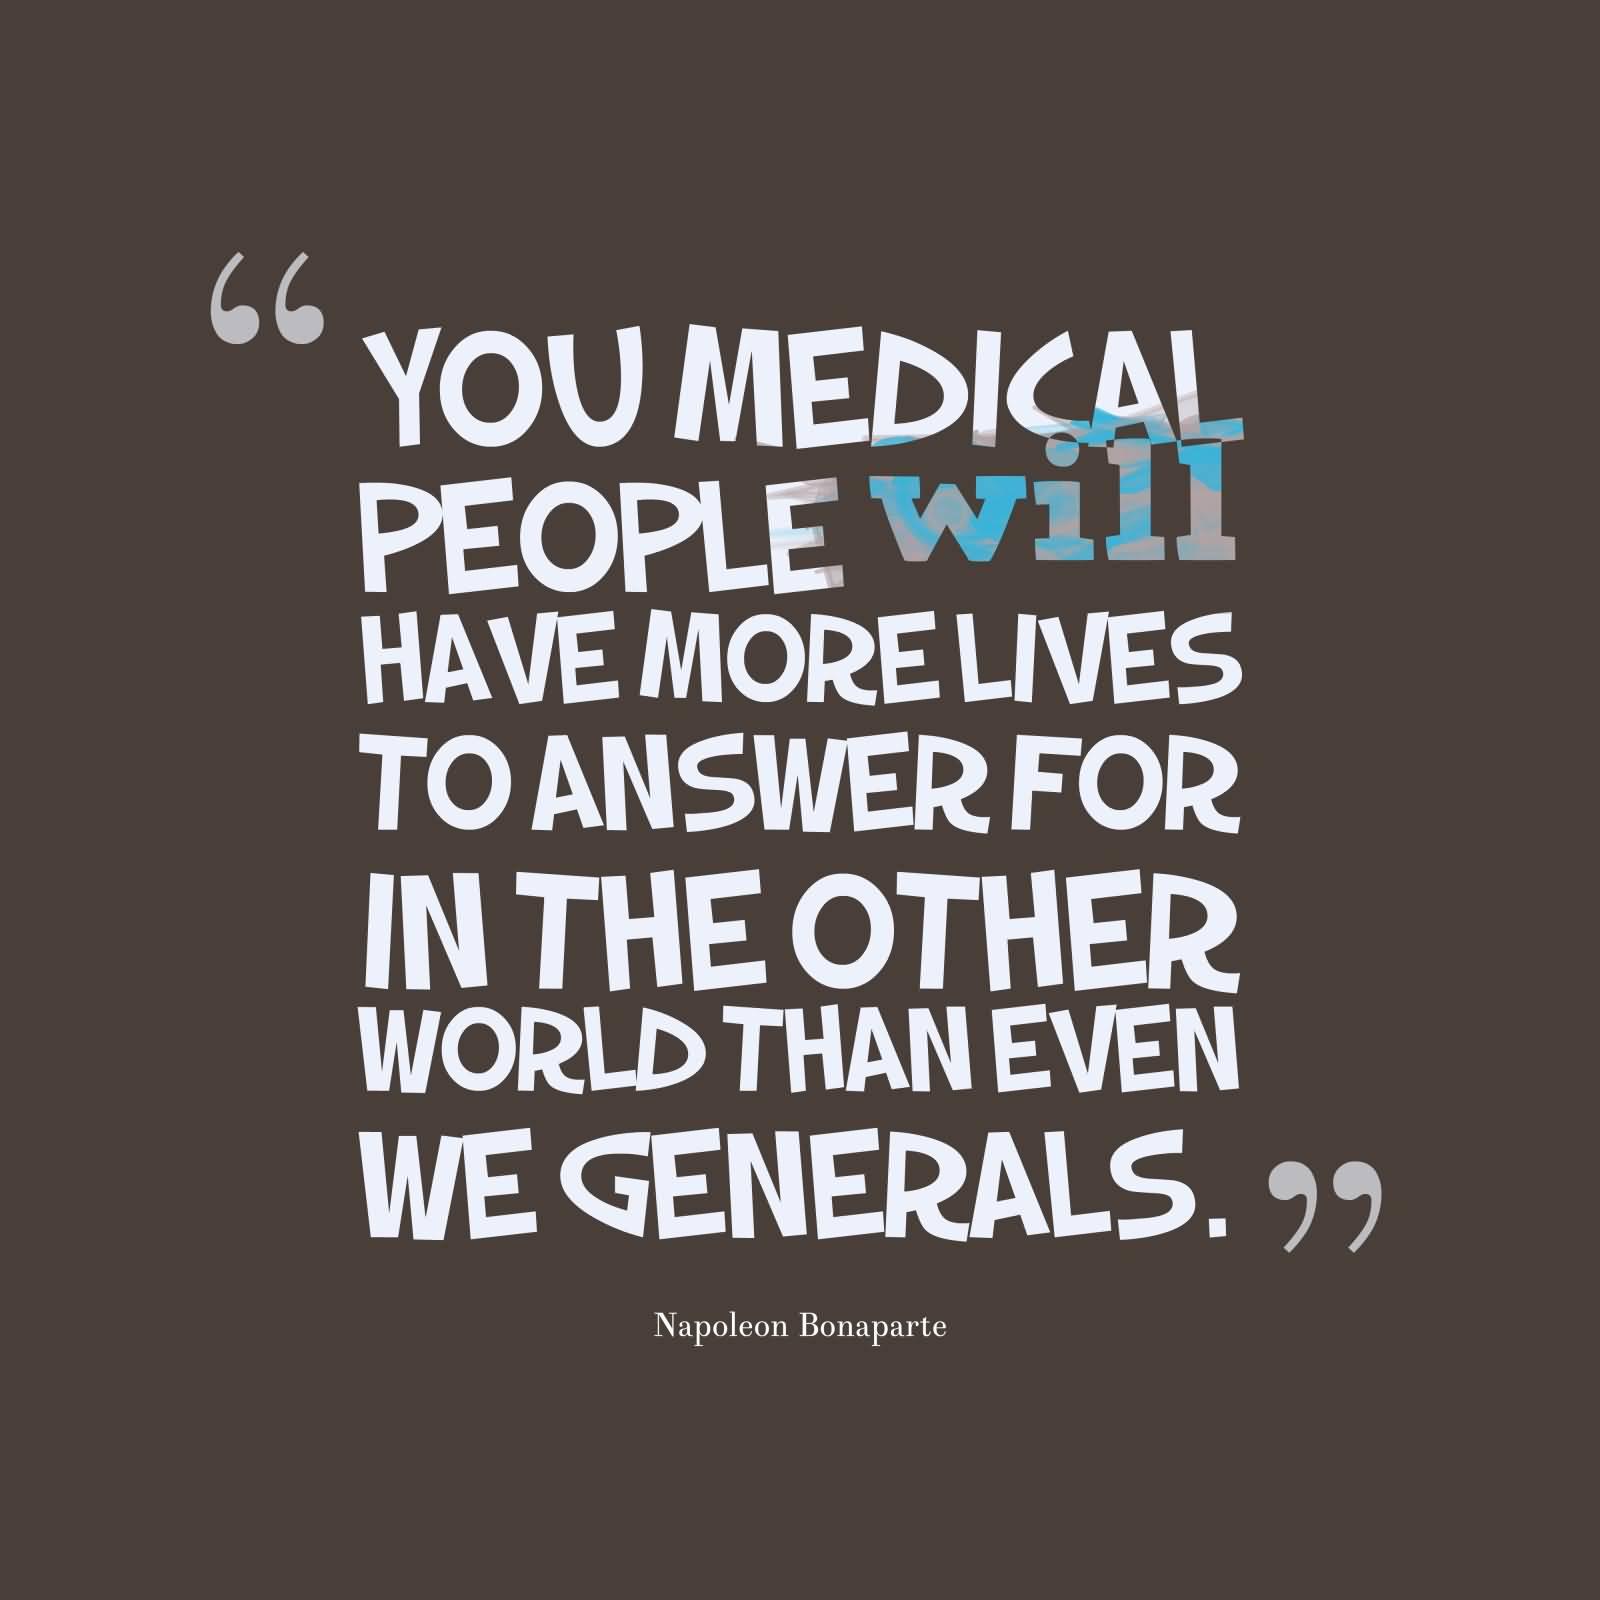 Napoleon Bonaparte Quote Wallpaper 64 Best Medicine Quotes And Sayings